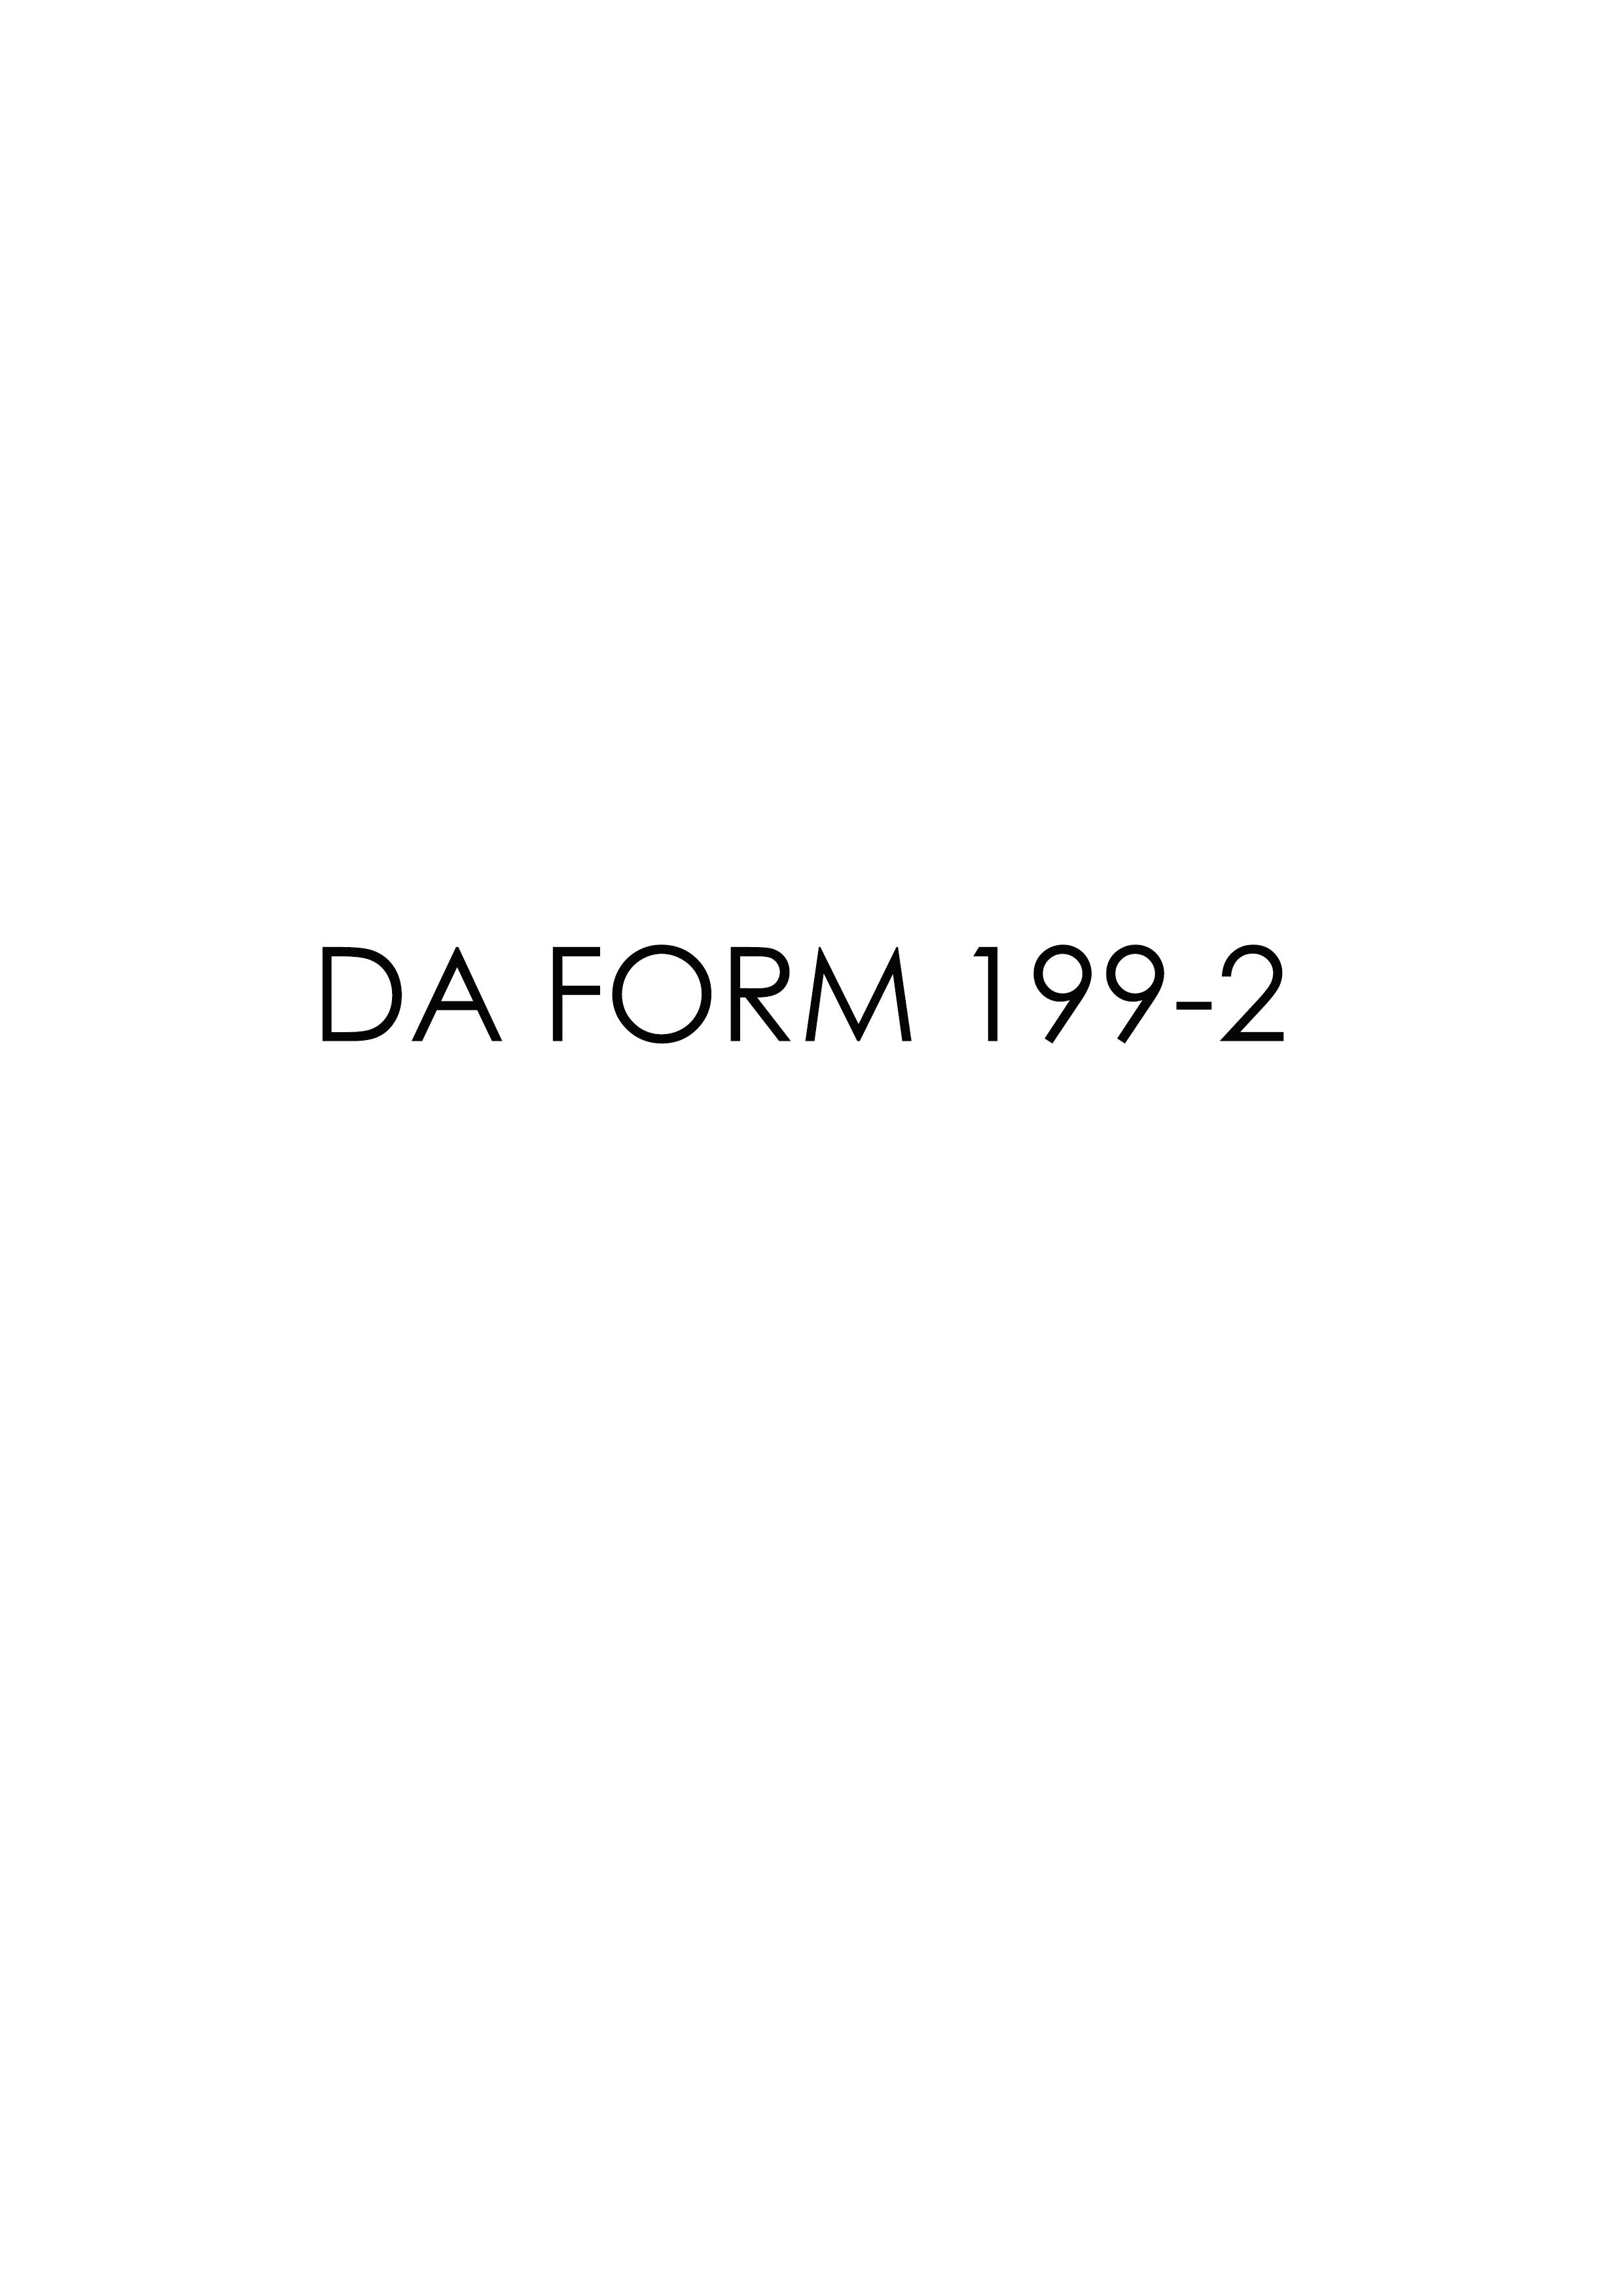 Download da Form 199-2 Free